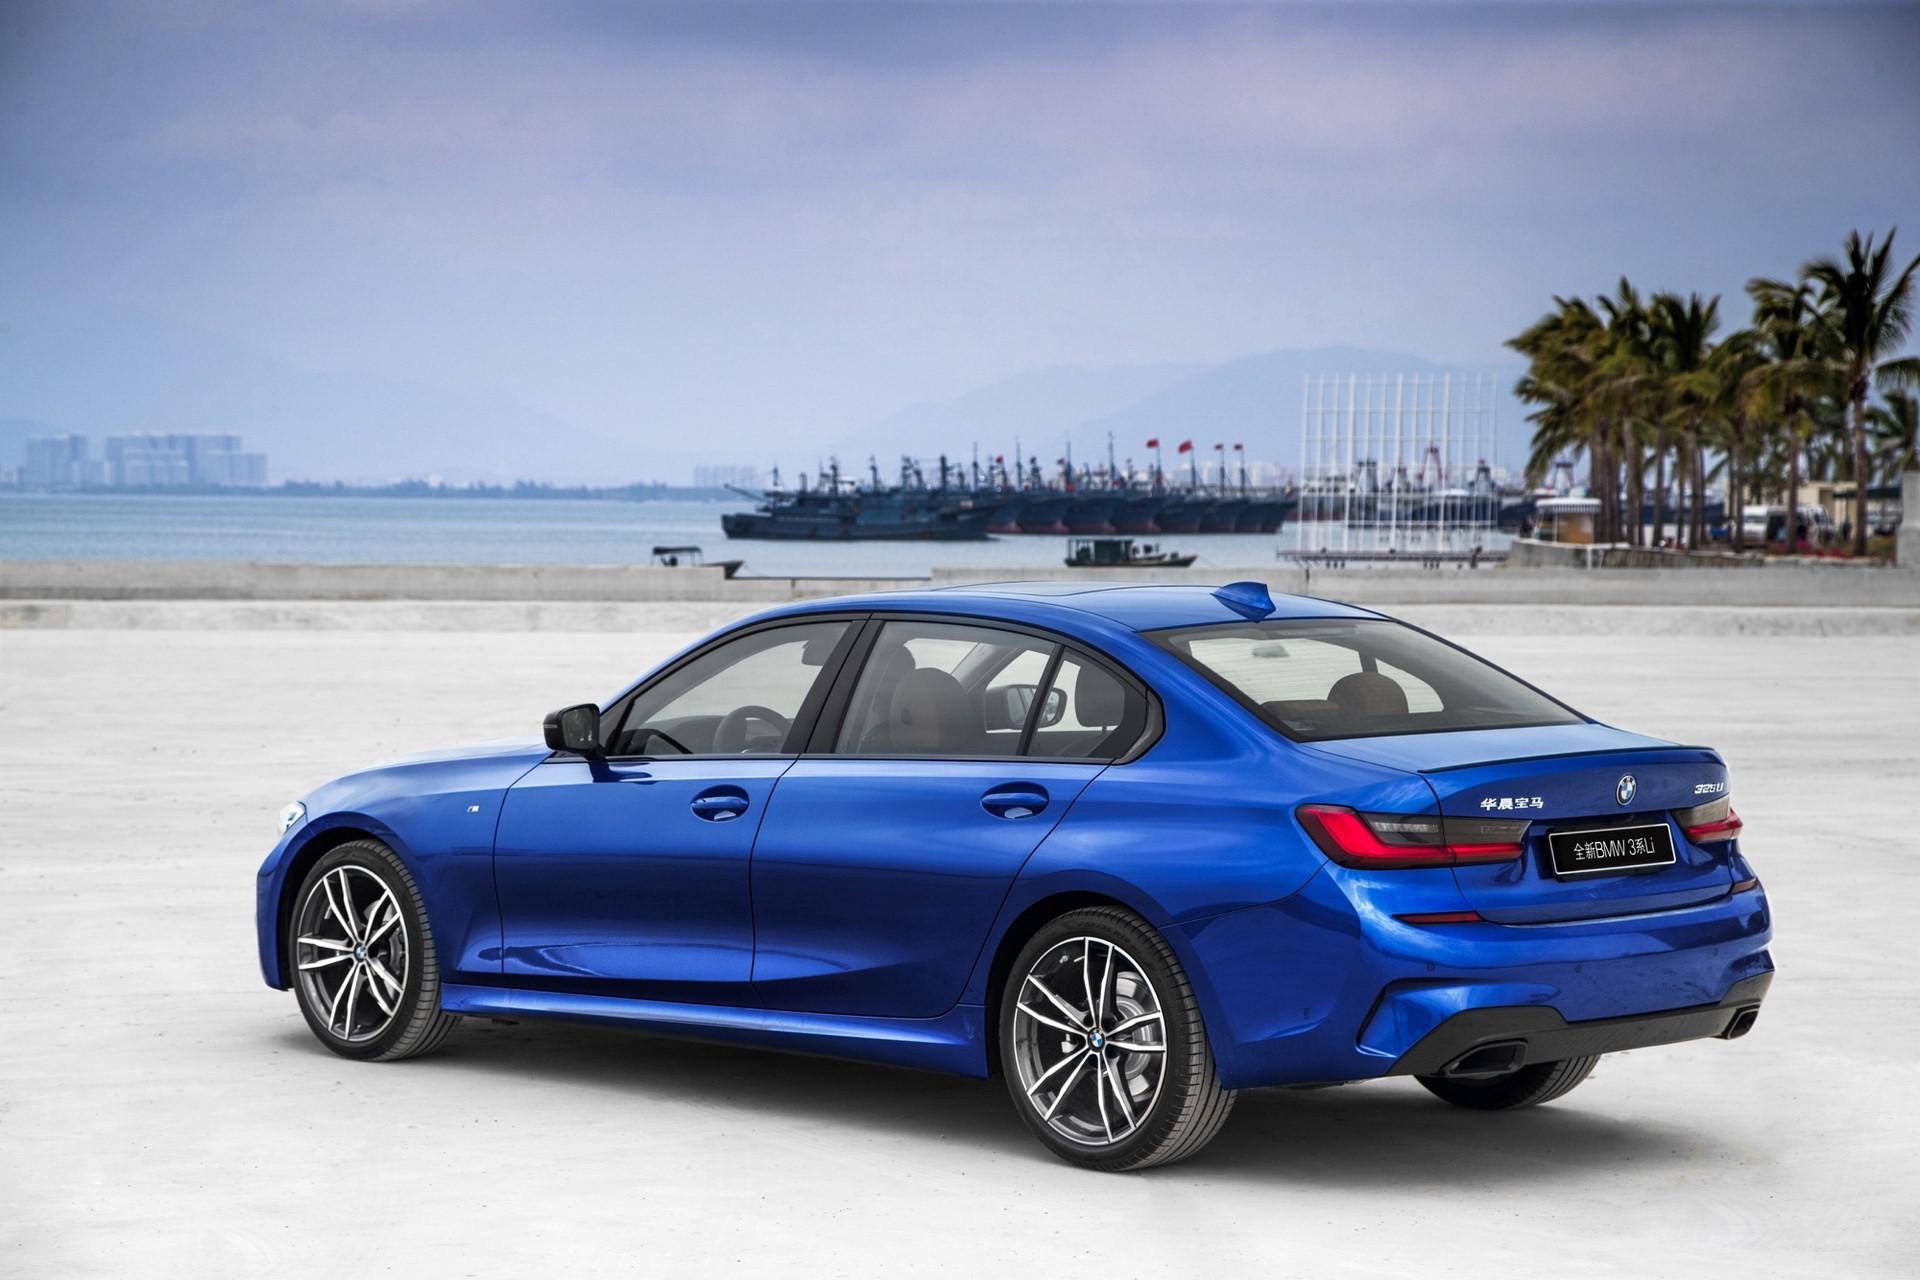 BMW-3-Series-LWB-Long-Wheelbase-2019-14